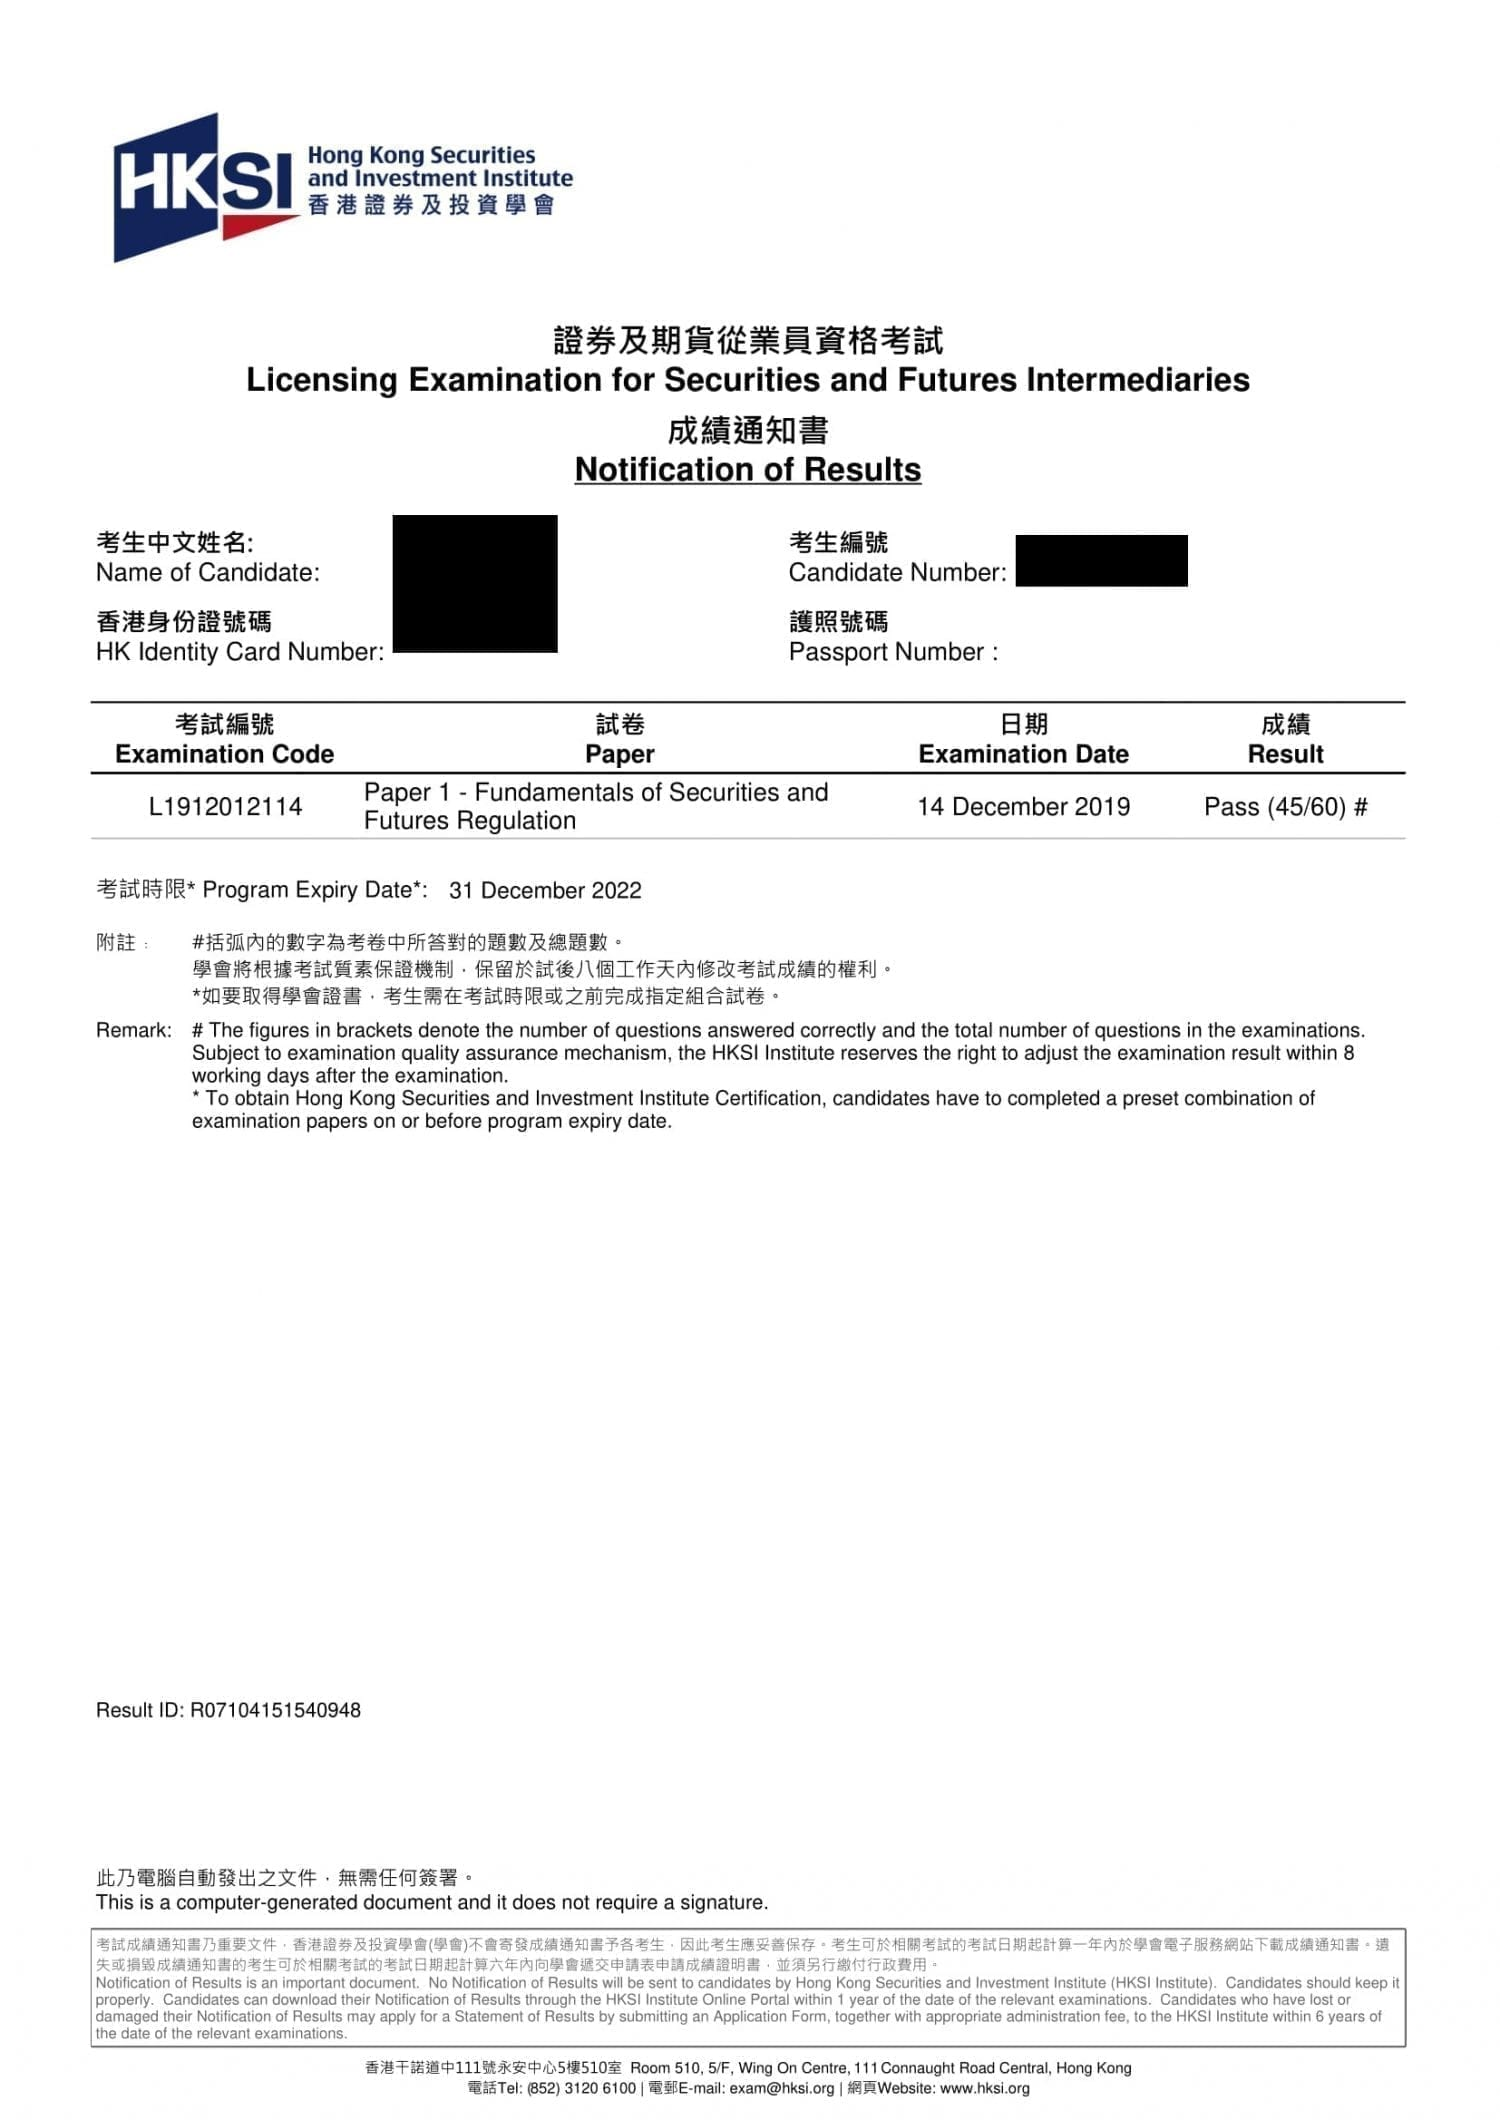 SQL 14/12/2019 LE Paper 1 證券期貨從業員資格考試卷一 Pass